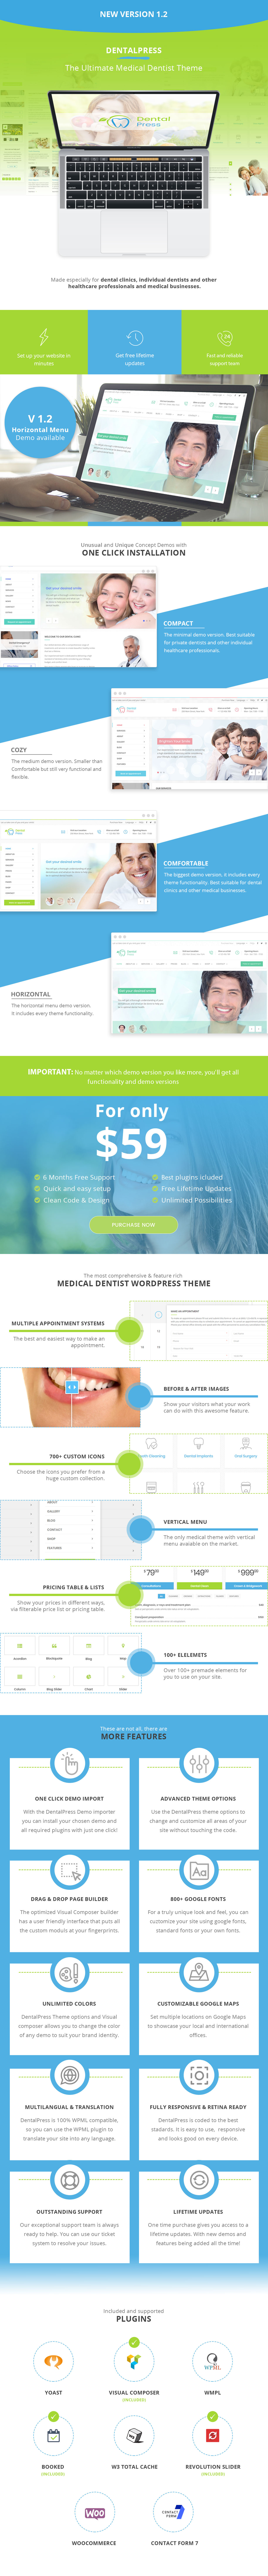 DentalPress - Ultimate Medical Dentist Theme - 1